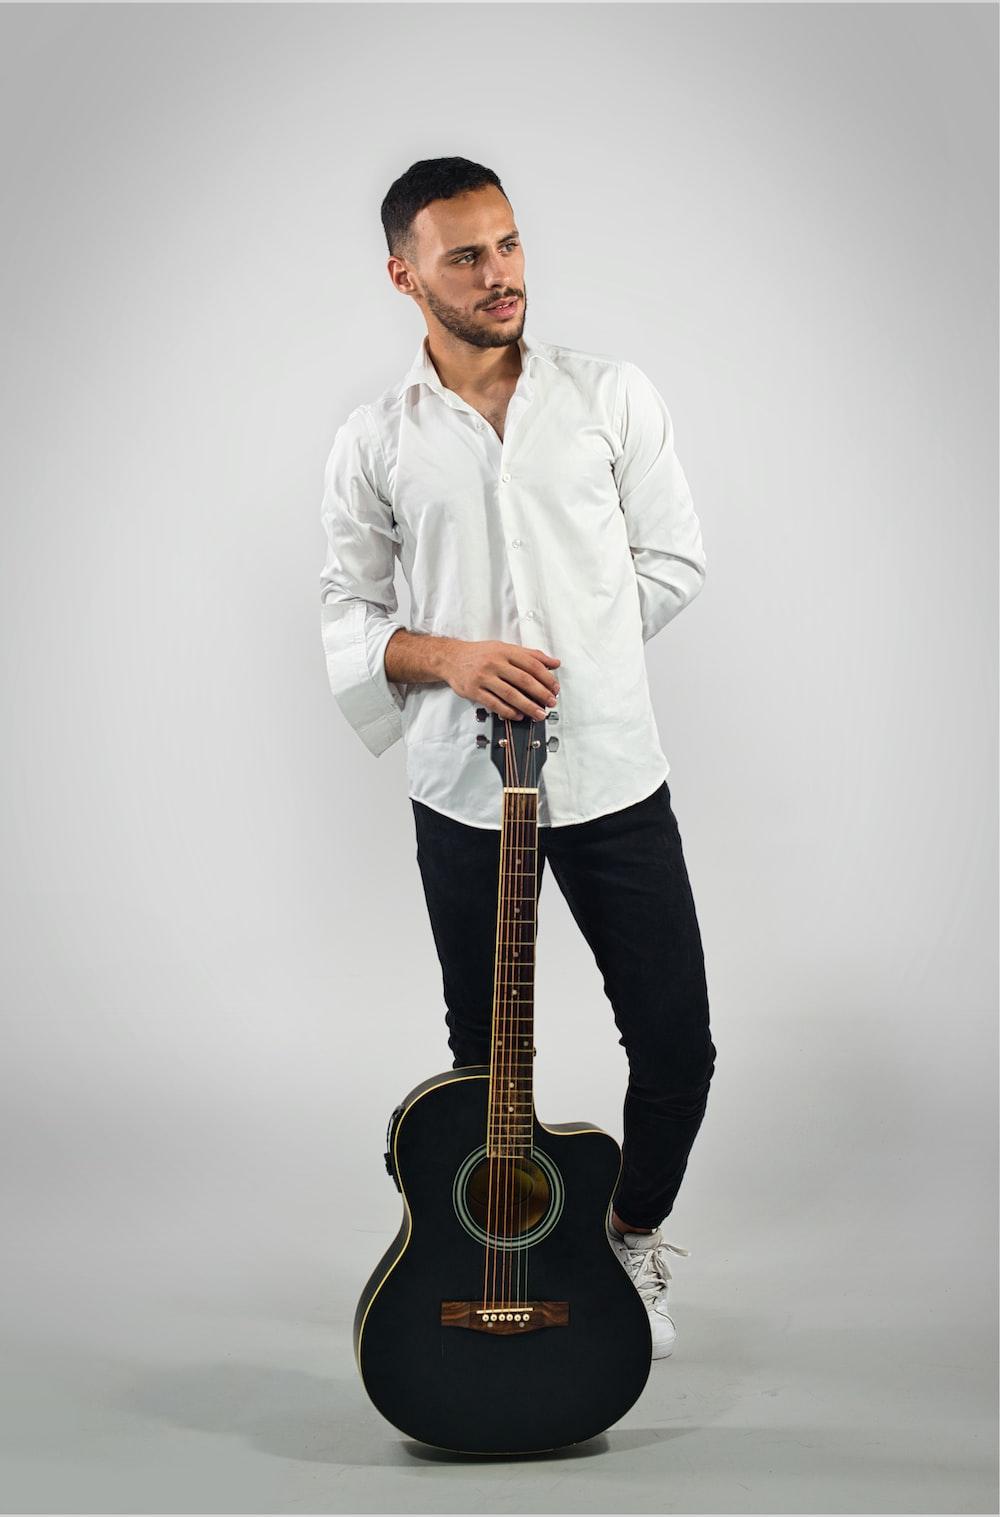 man in white dress shirt holding black acoustic guitar